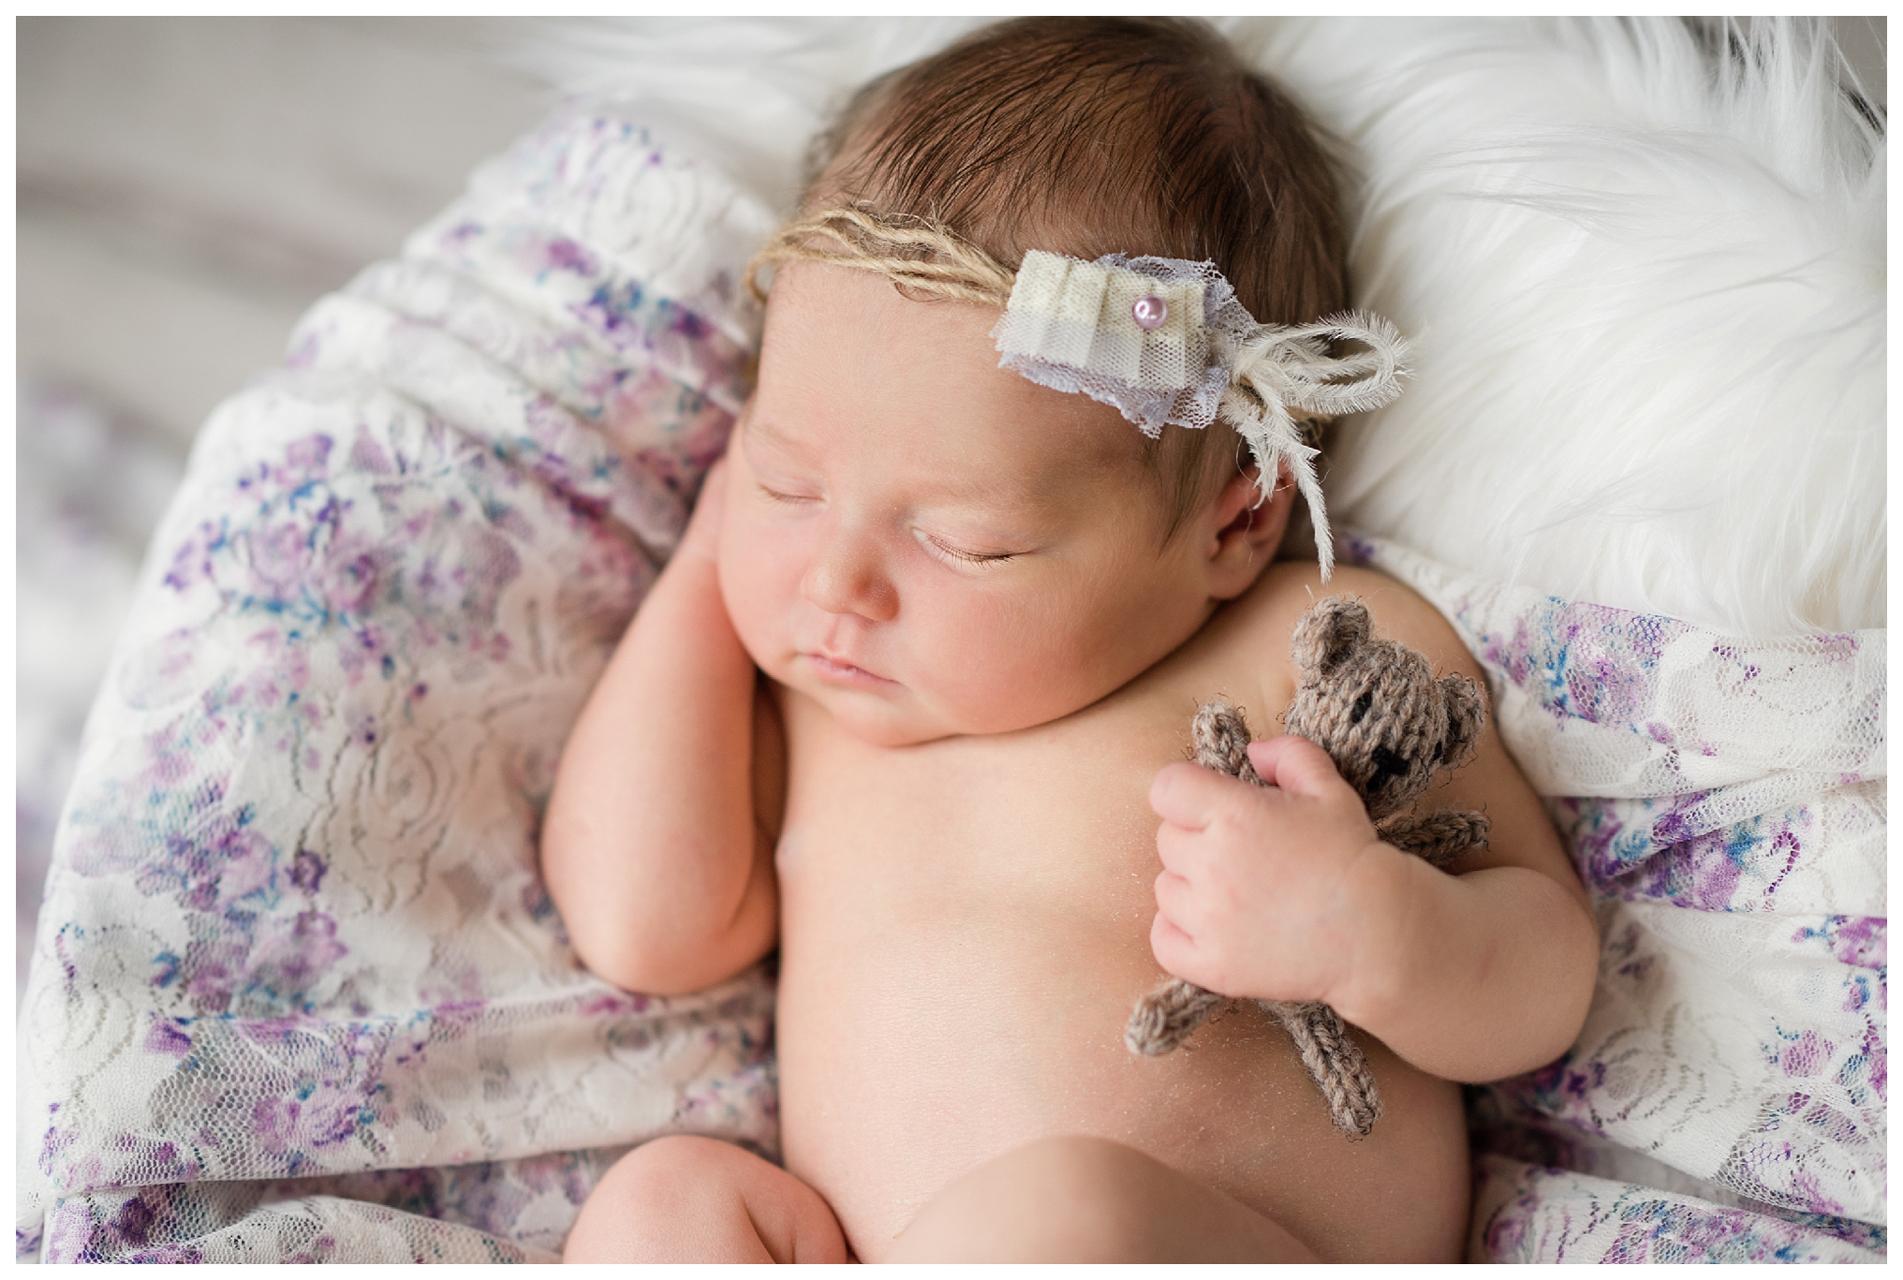 Newborn-Photographer-Sweet-Light-Portraits09.jpg